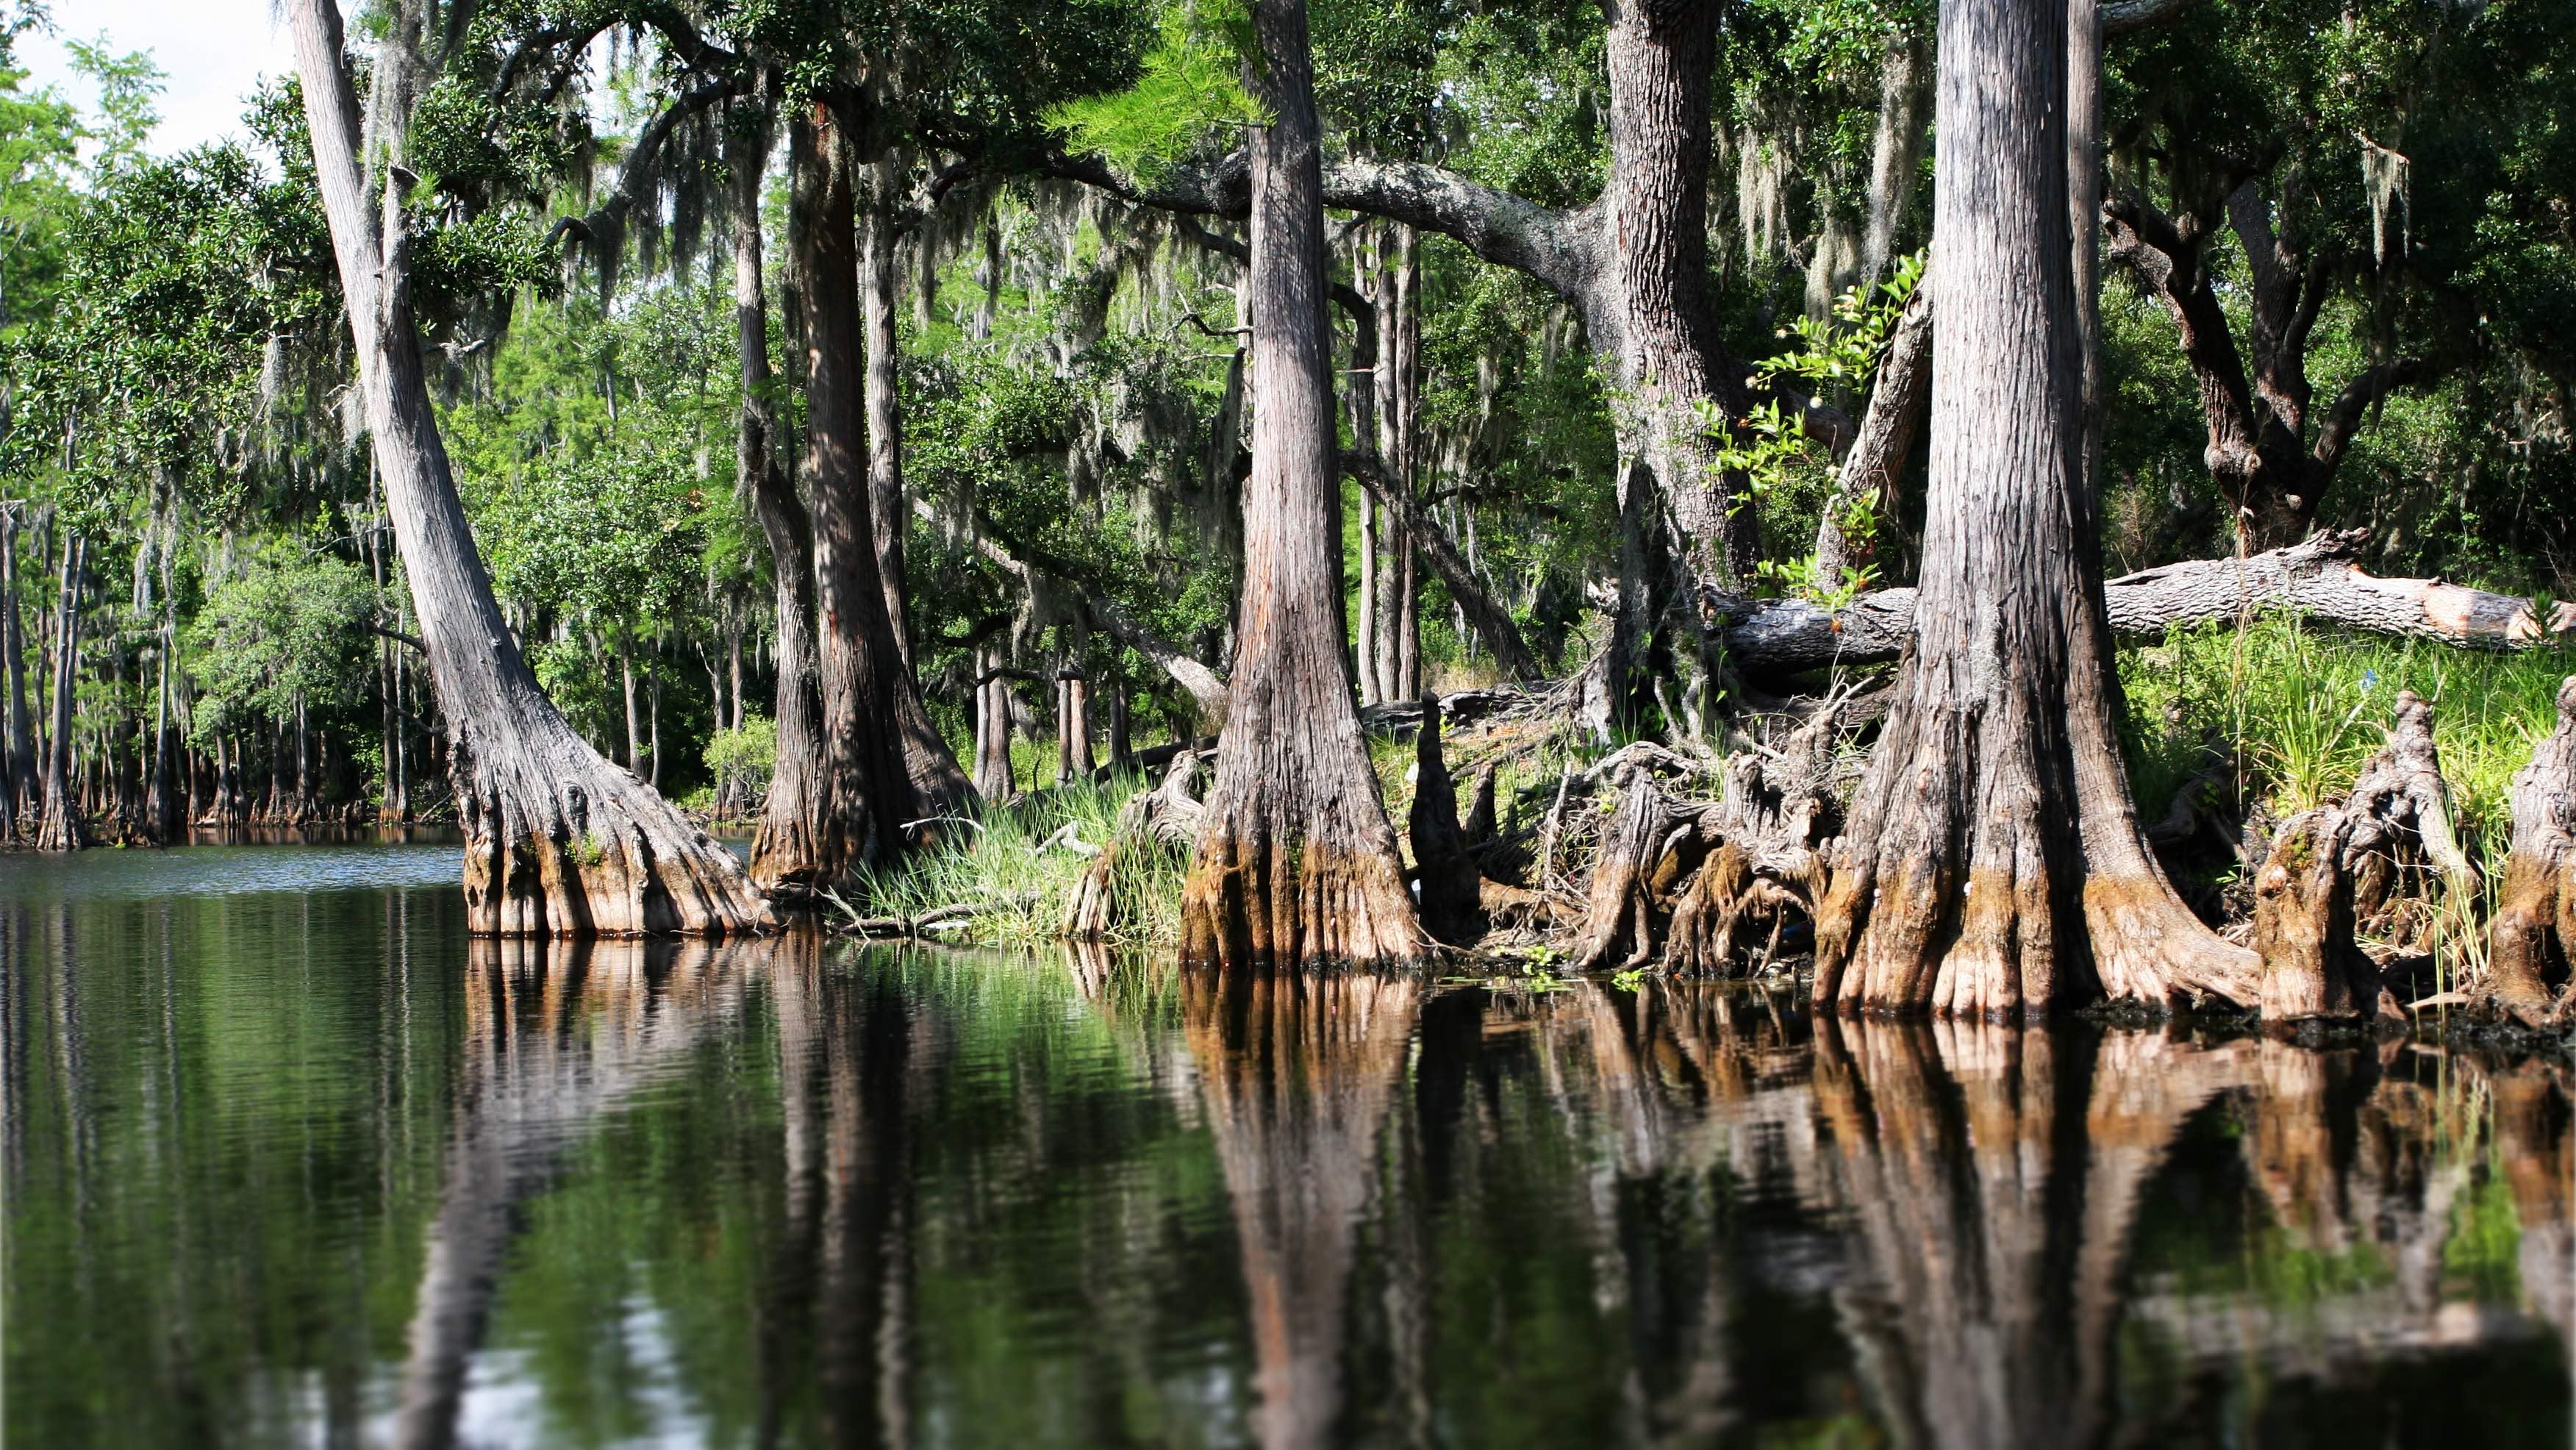 Everglades mangroven-landschap